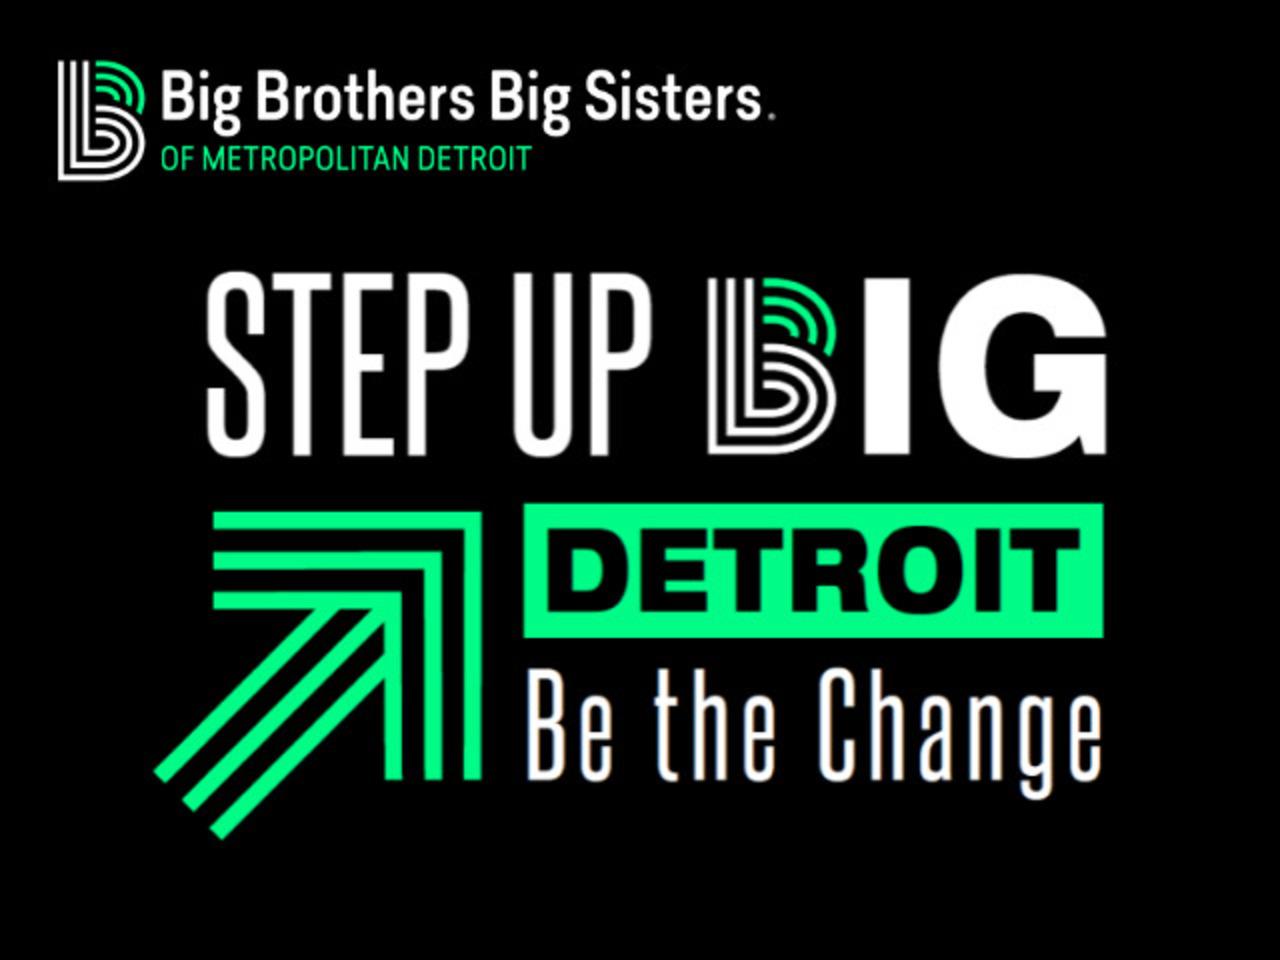 Step Up BIG Detroit!